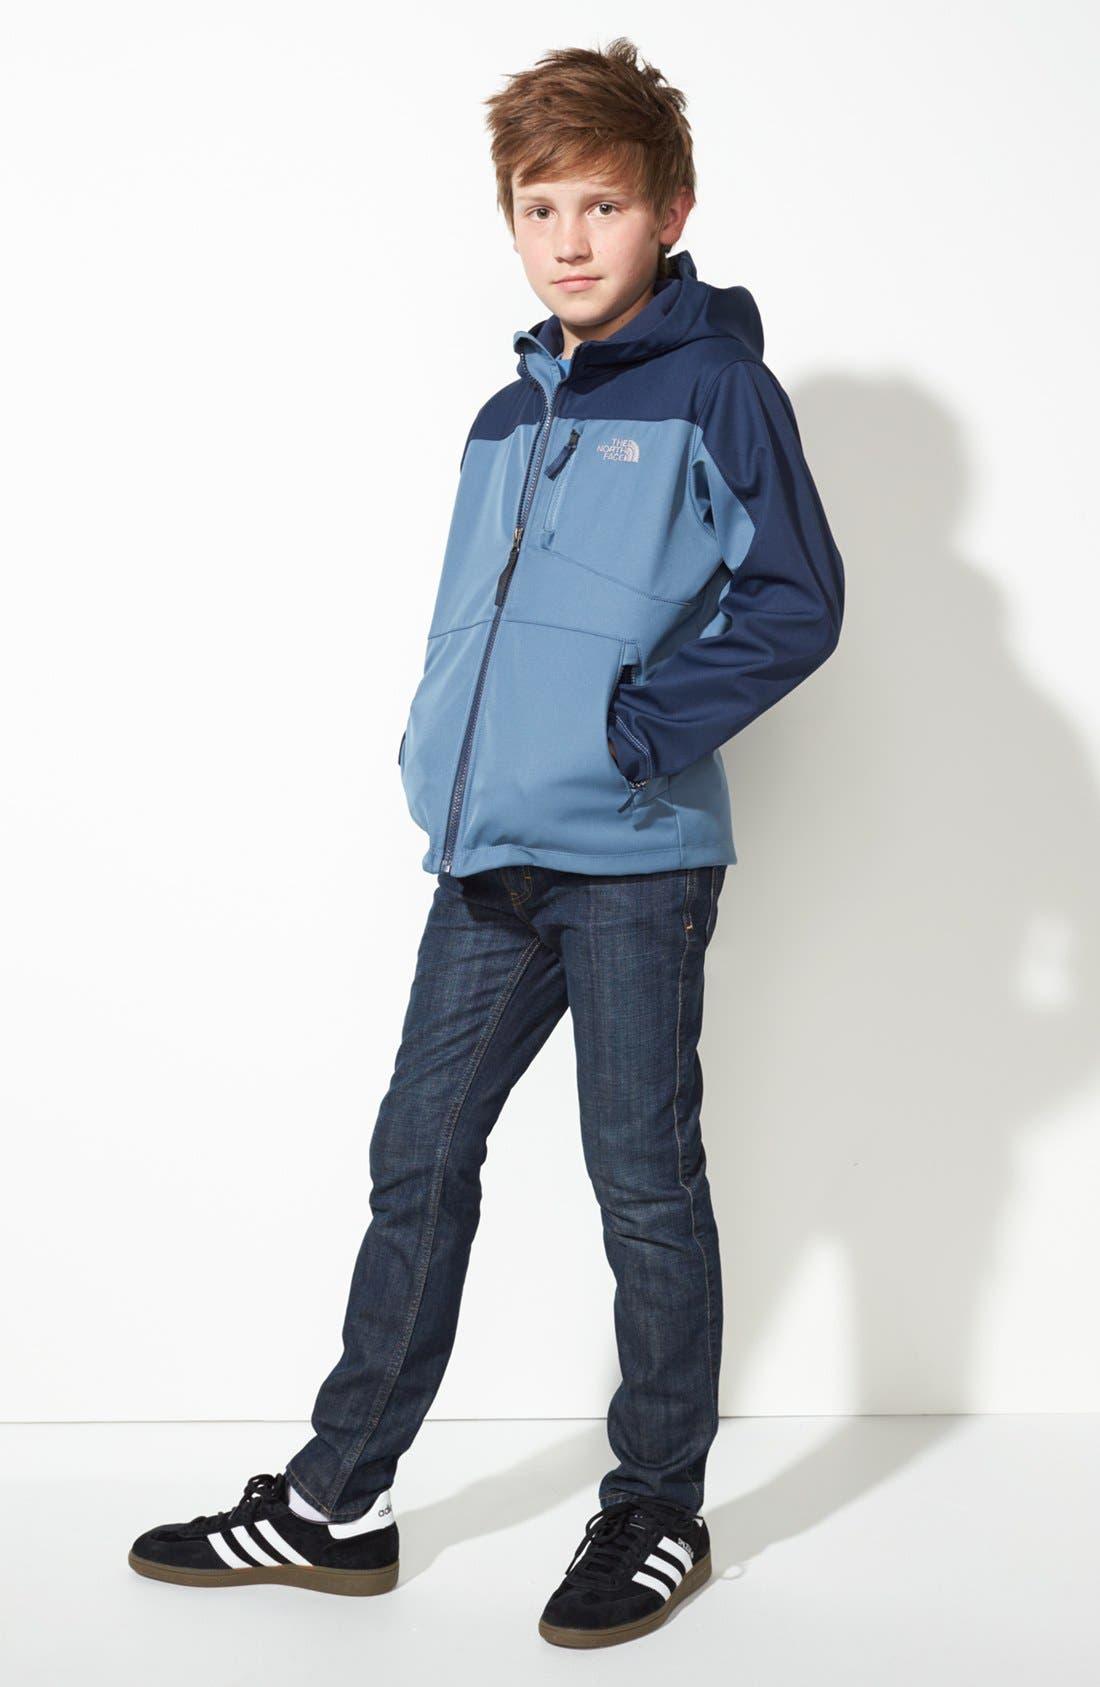 Main Image - The North Face Jacket & Joe's Jeans (Big Boys)